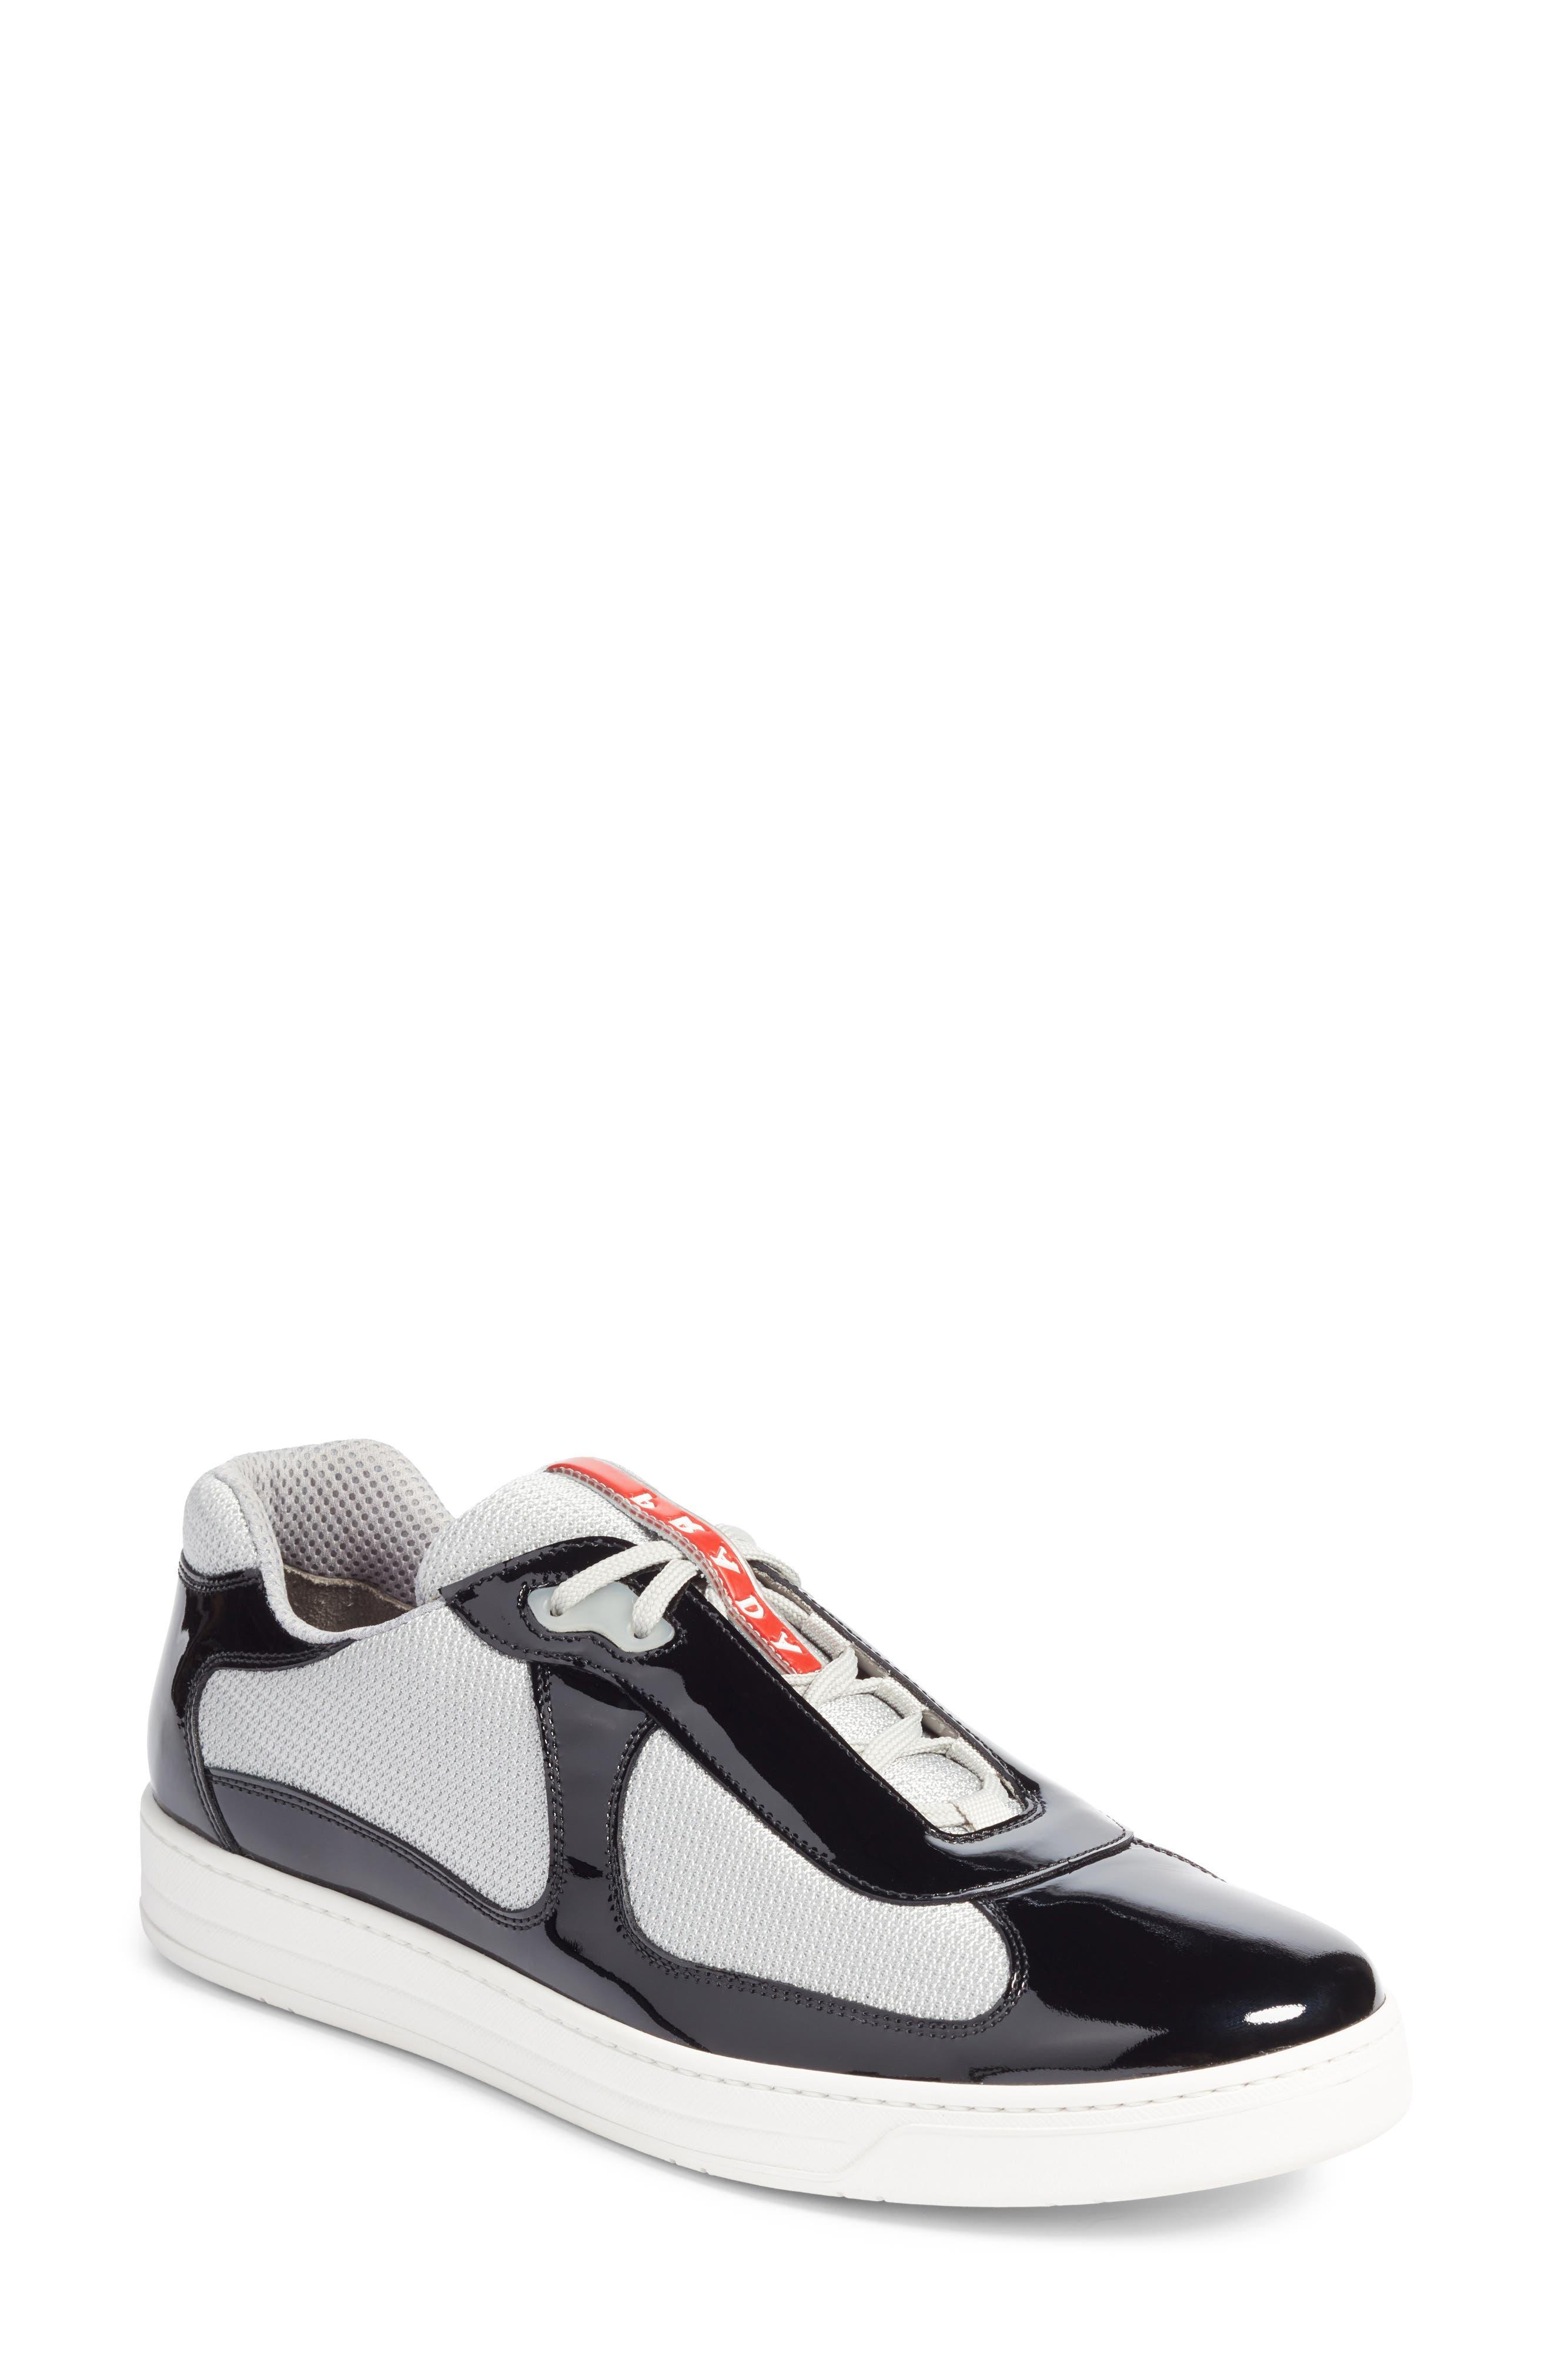 Prada Linea Rossa New America's Cup Sneaker (Men)